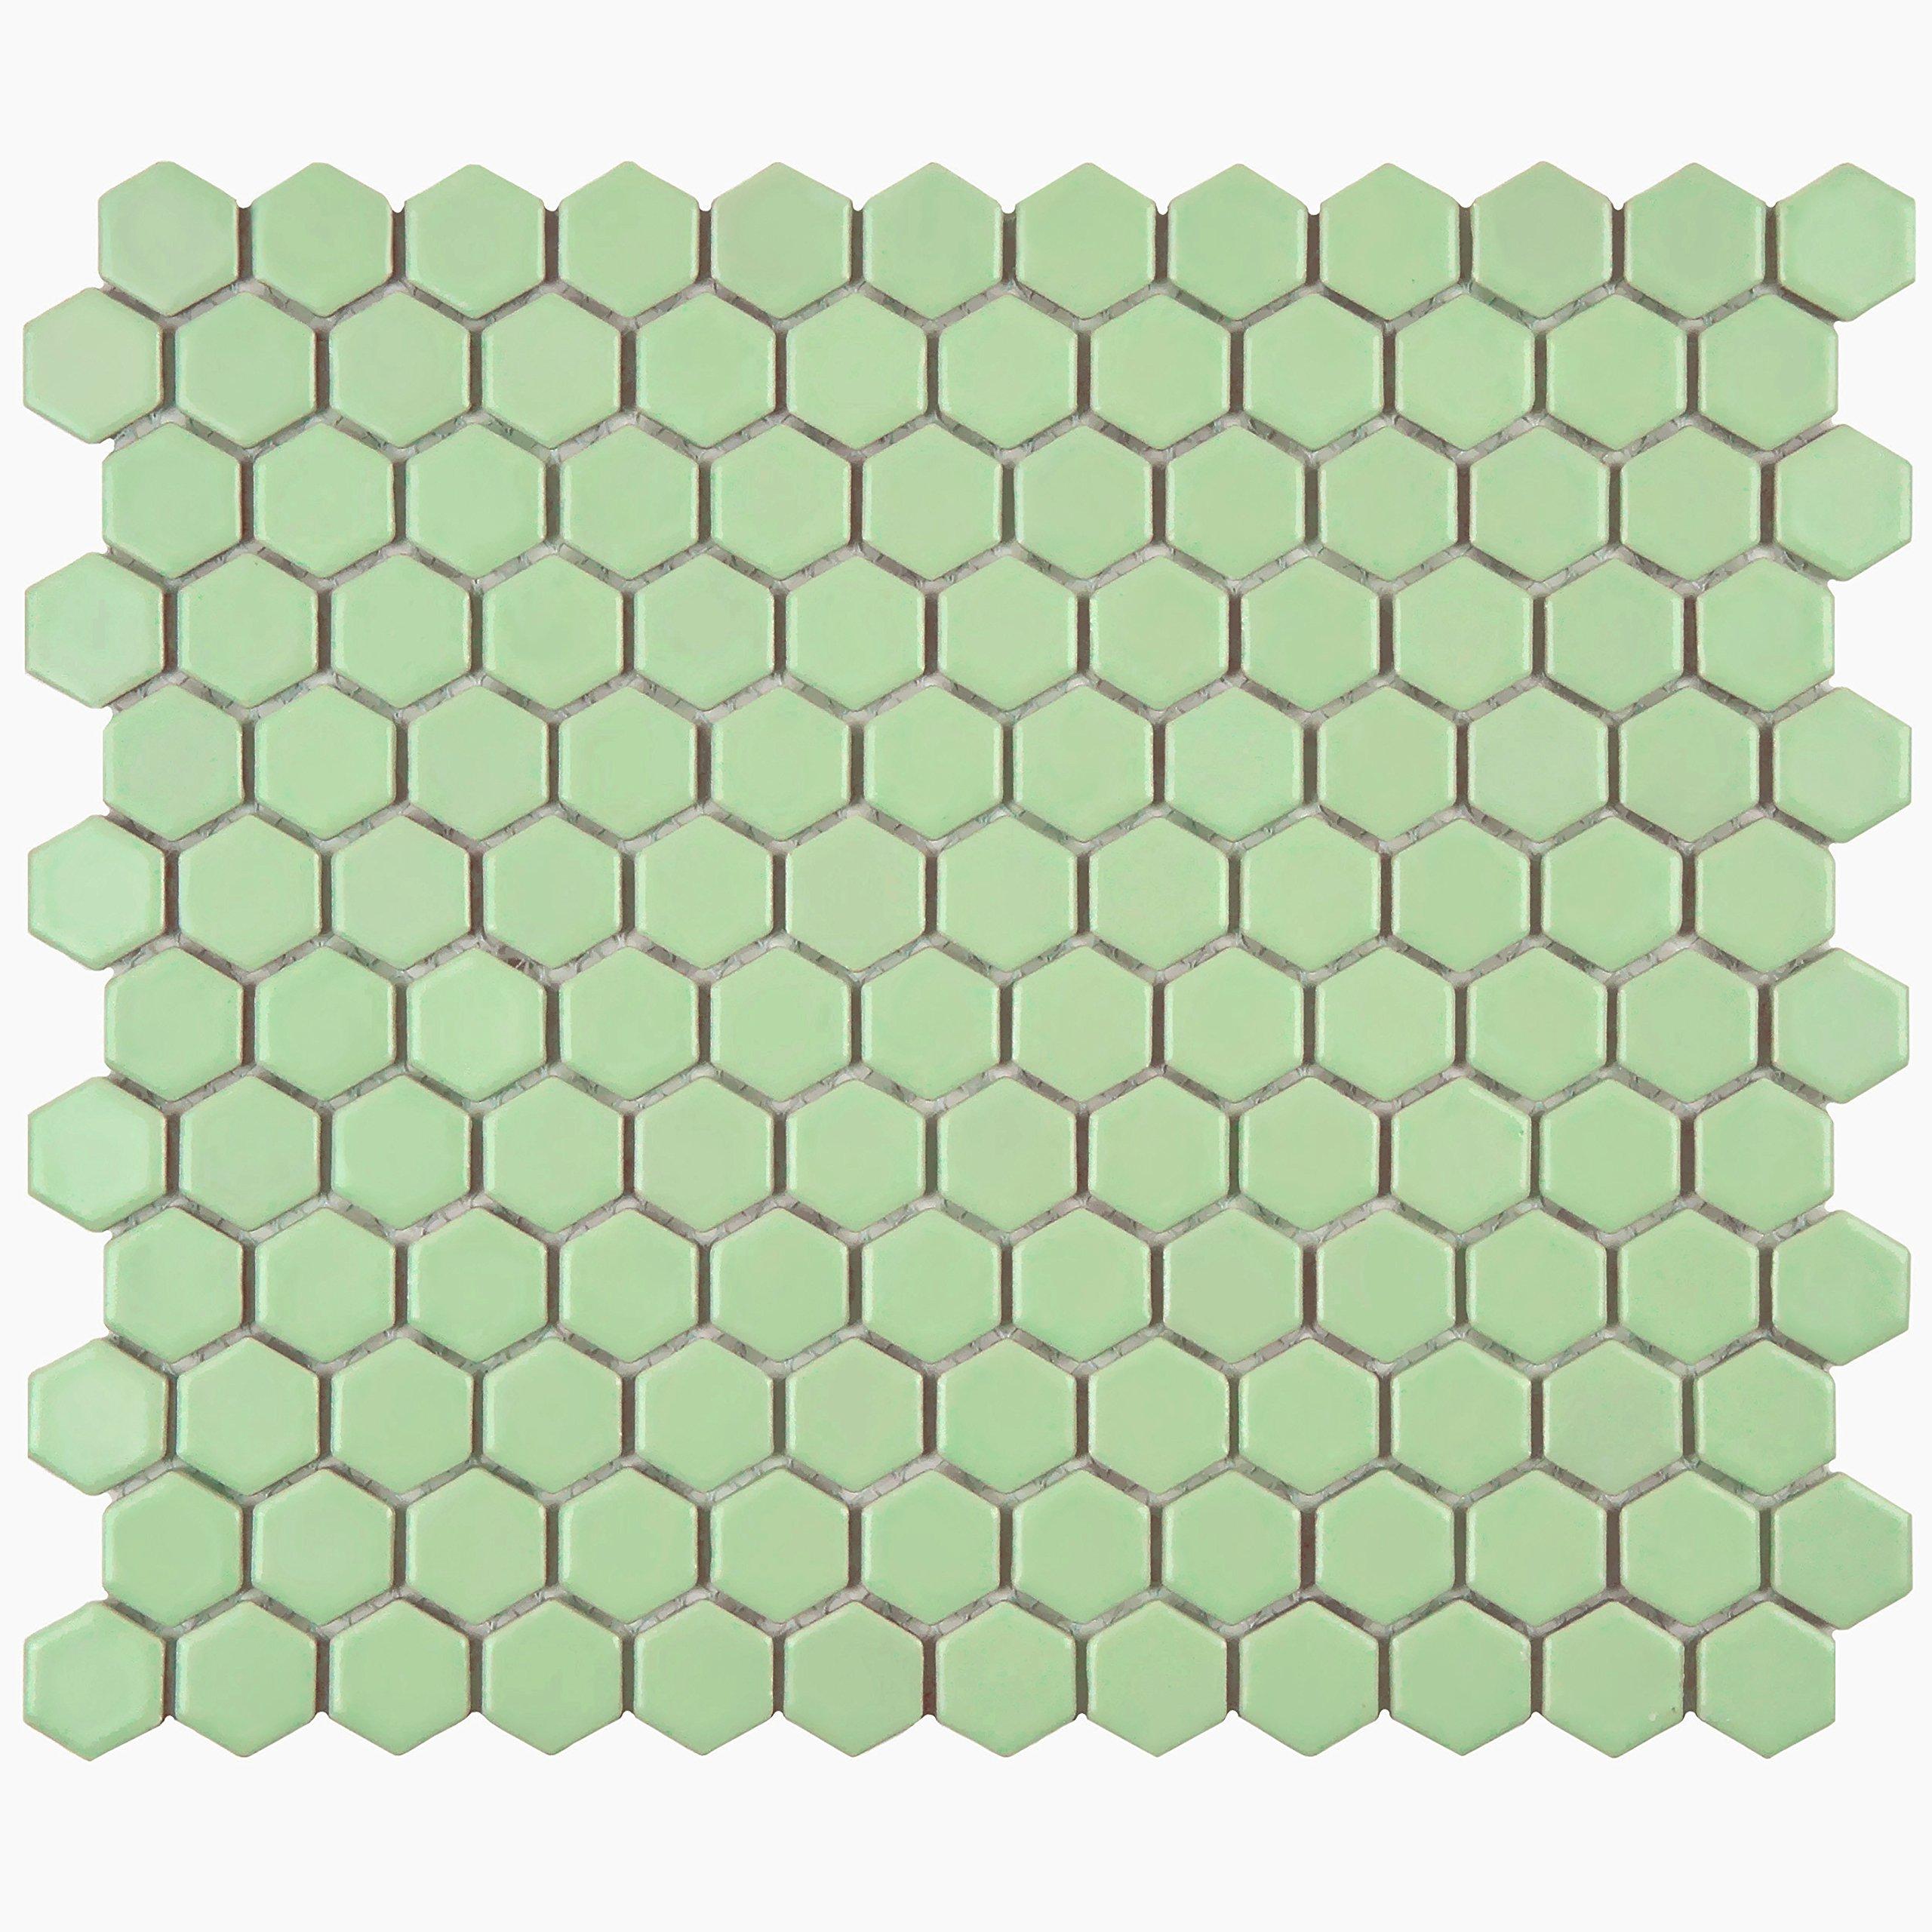 SomerTile FXLM1HMG Retro Hex Porcelain Floor and Wall Tile, 10.25'' x 11.75'', Matte Light Green